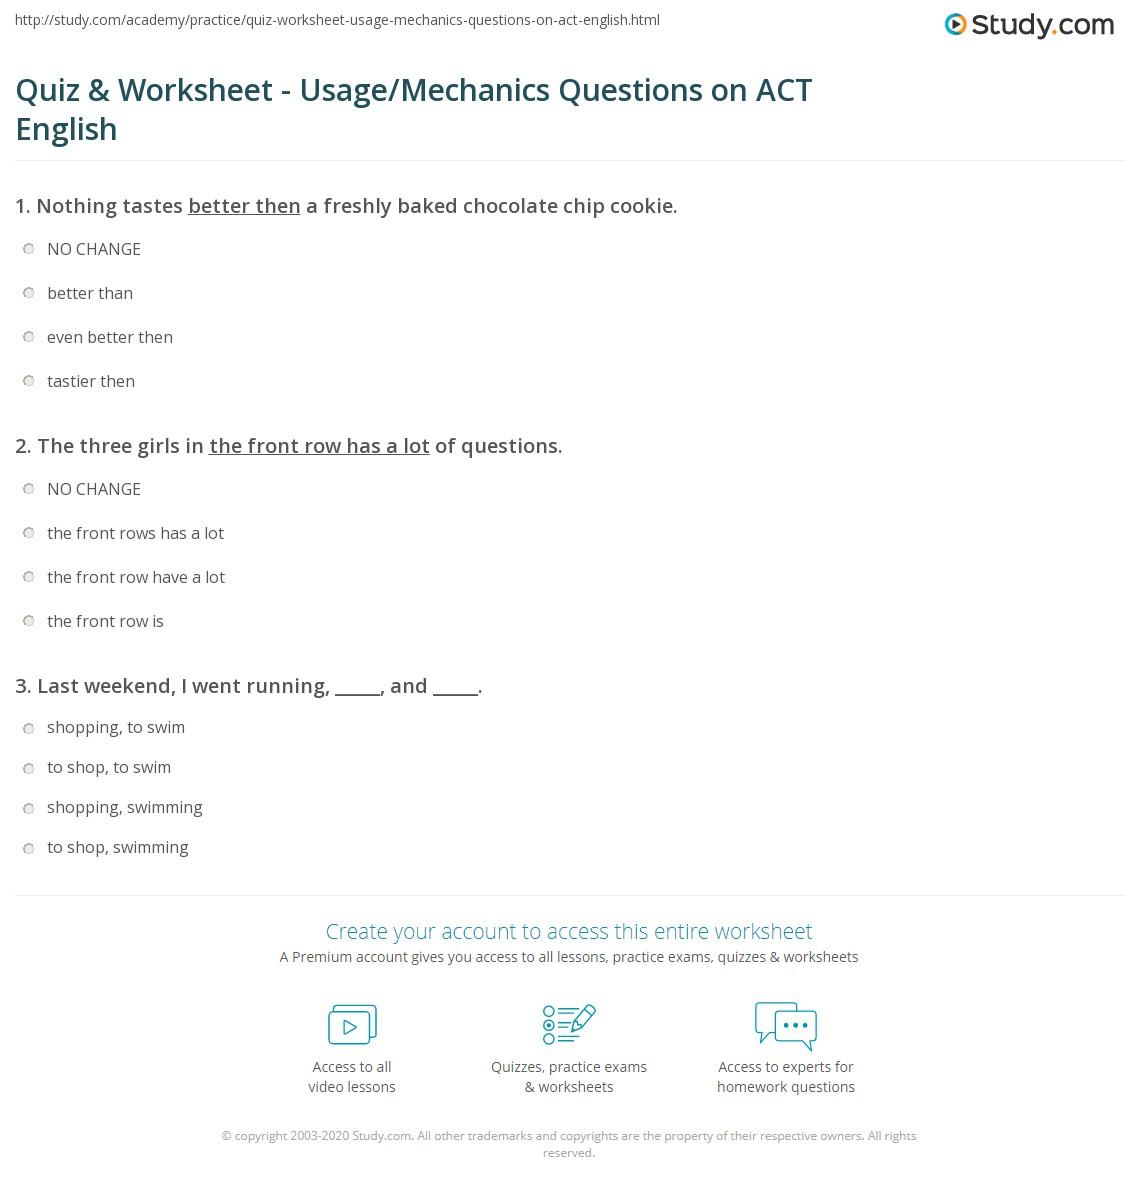 Quiz Worksheet Usage Mechanics Questions On Act